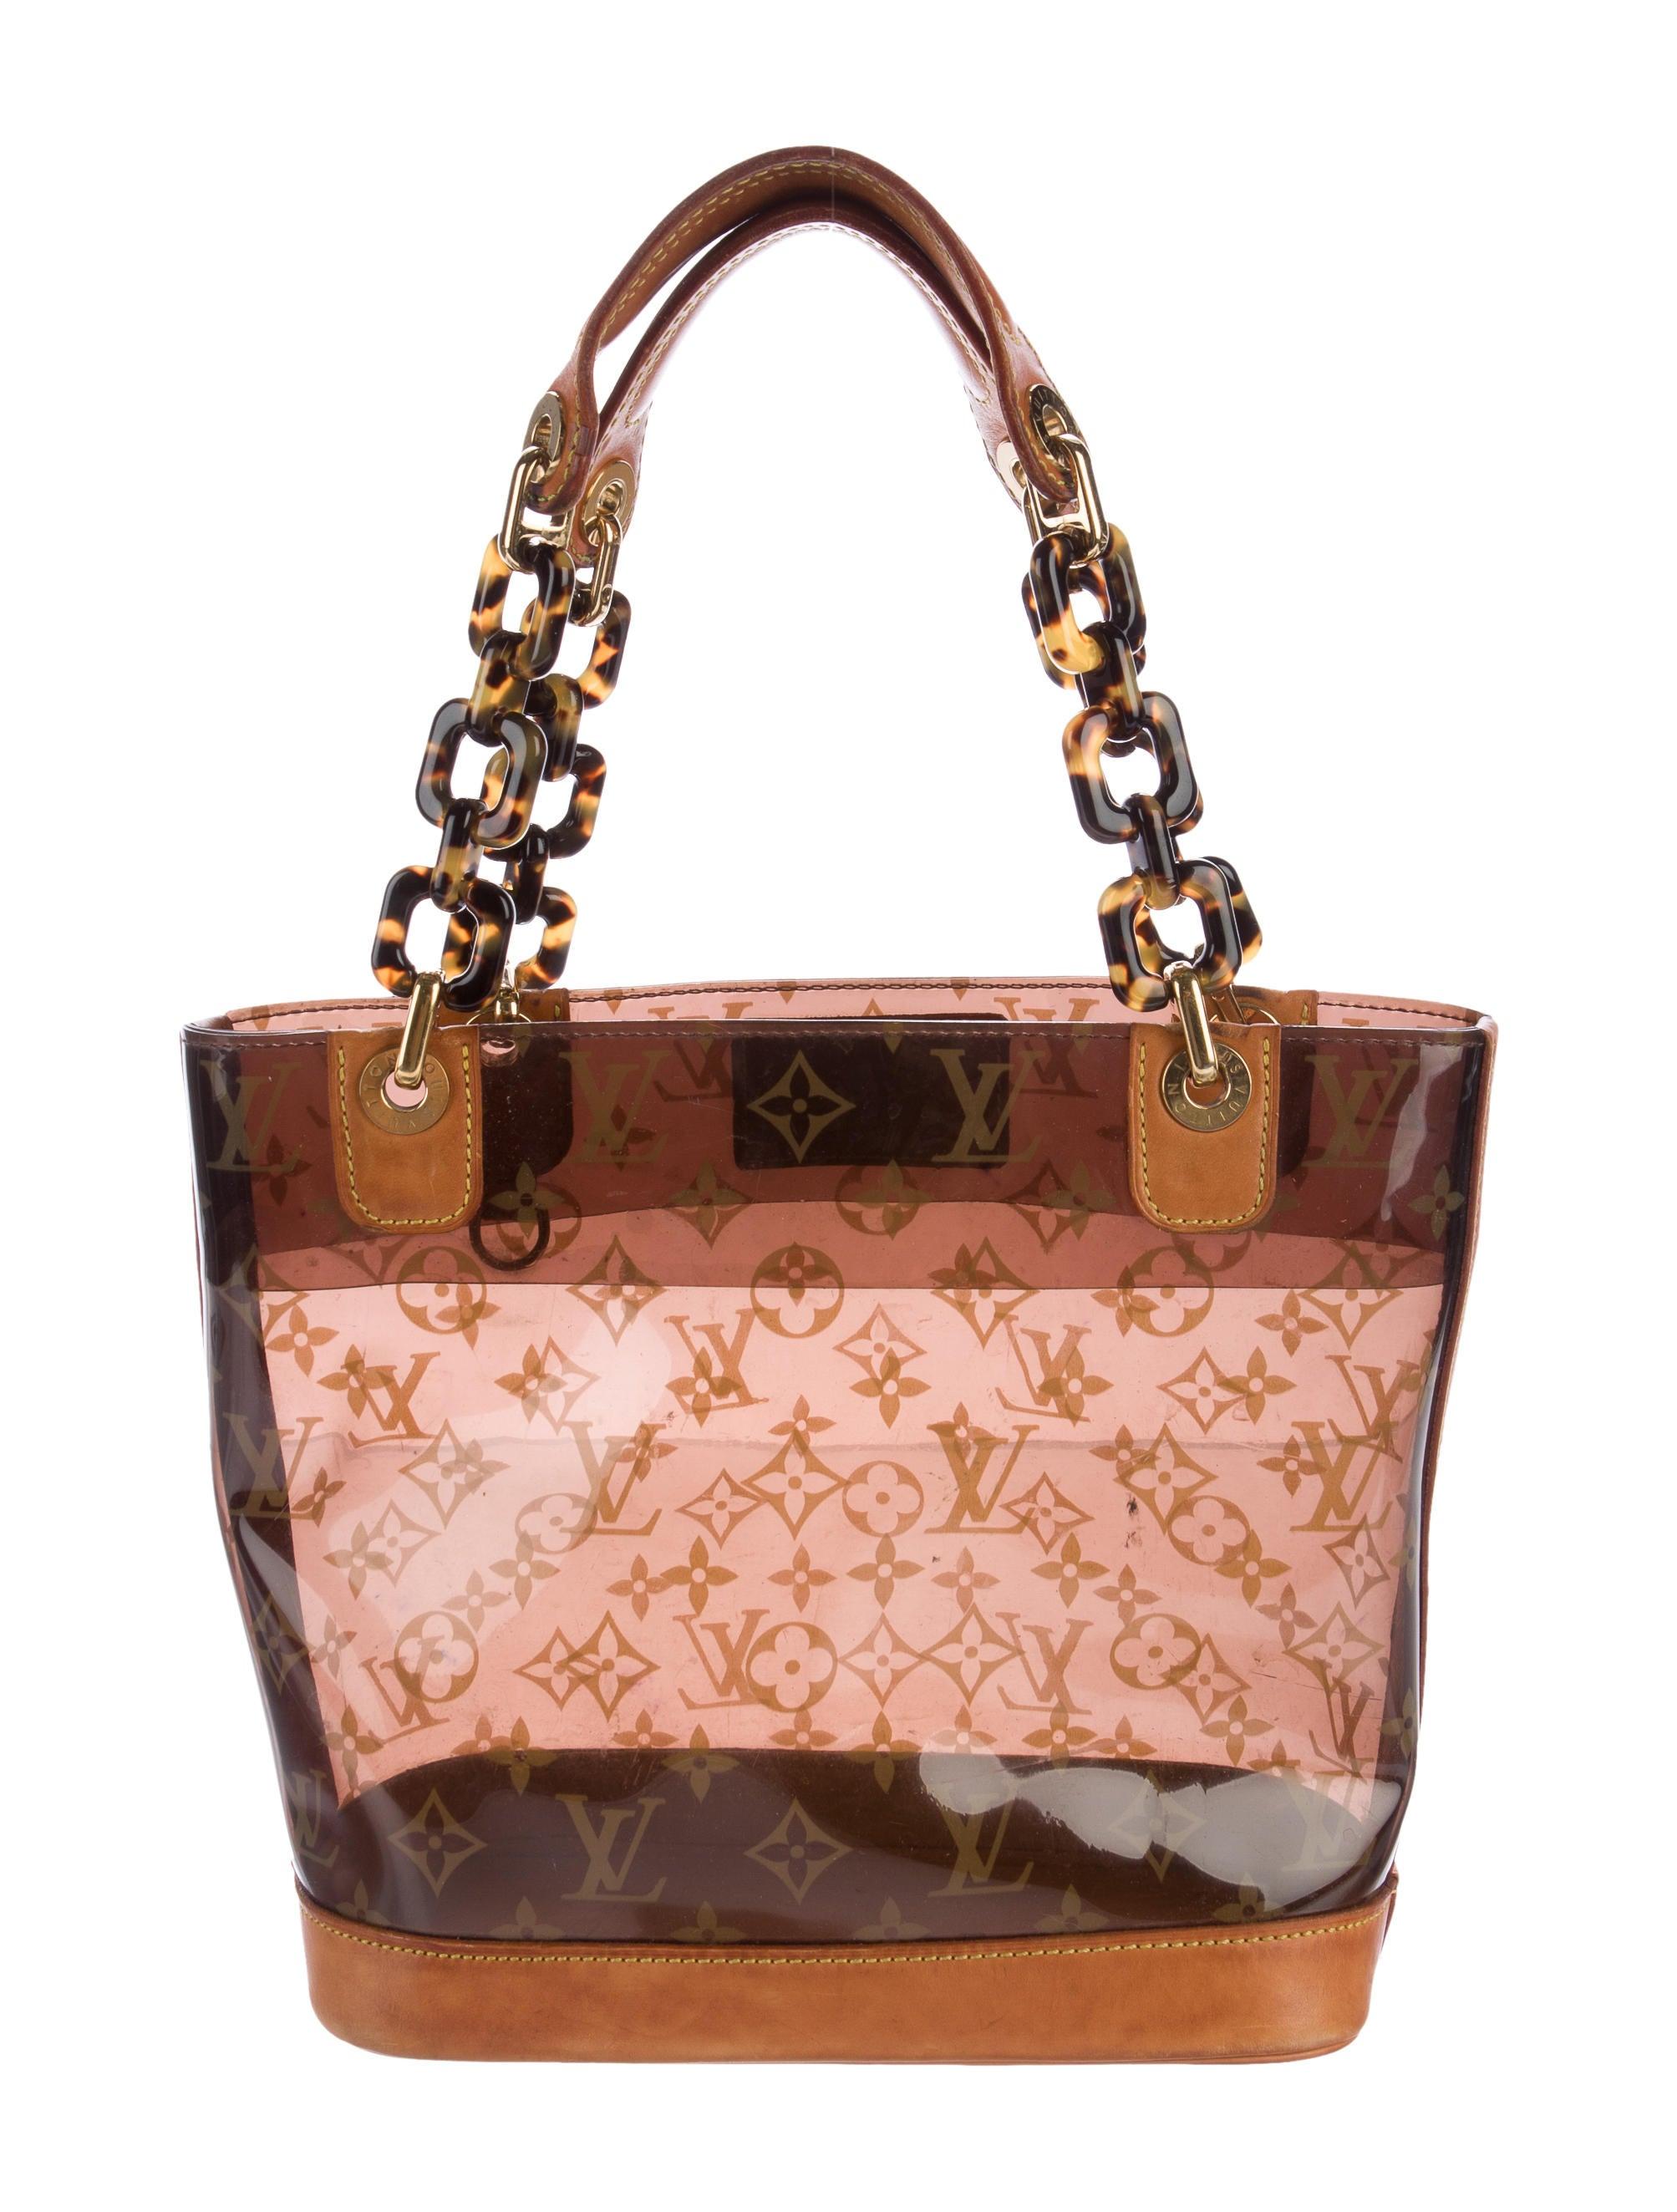 Sac Louis Vuitton Matelassé : Louis vuitton cabas sac ambre pm handbags lou